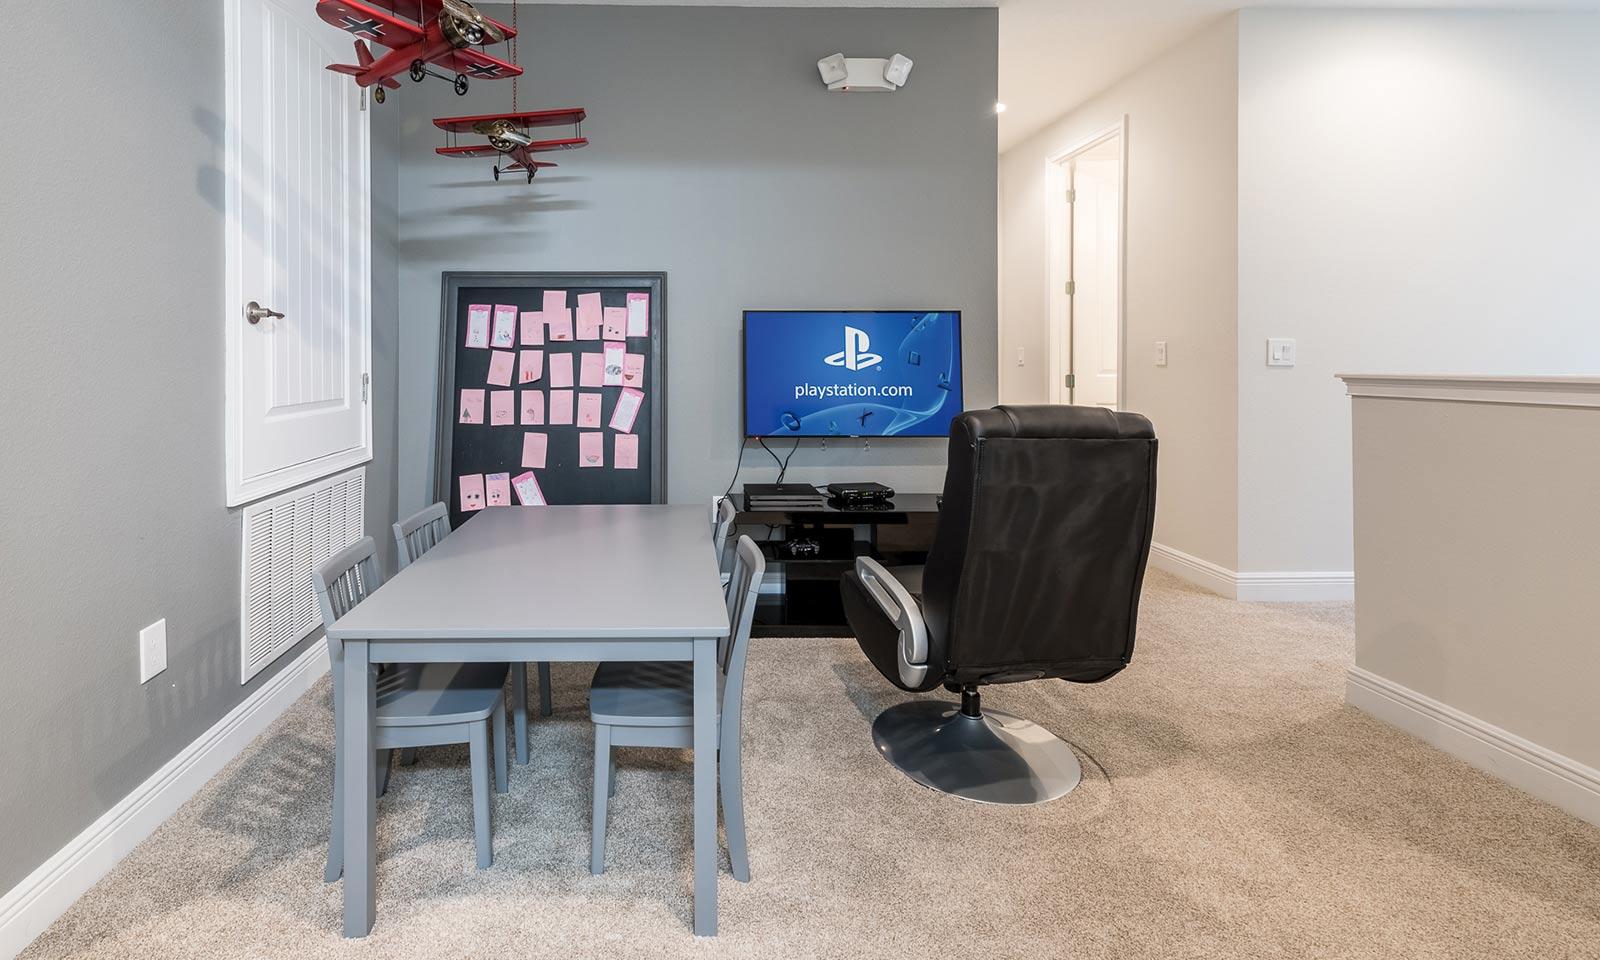 [amenities:video-games:3] Video Games